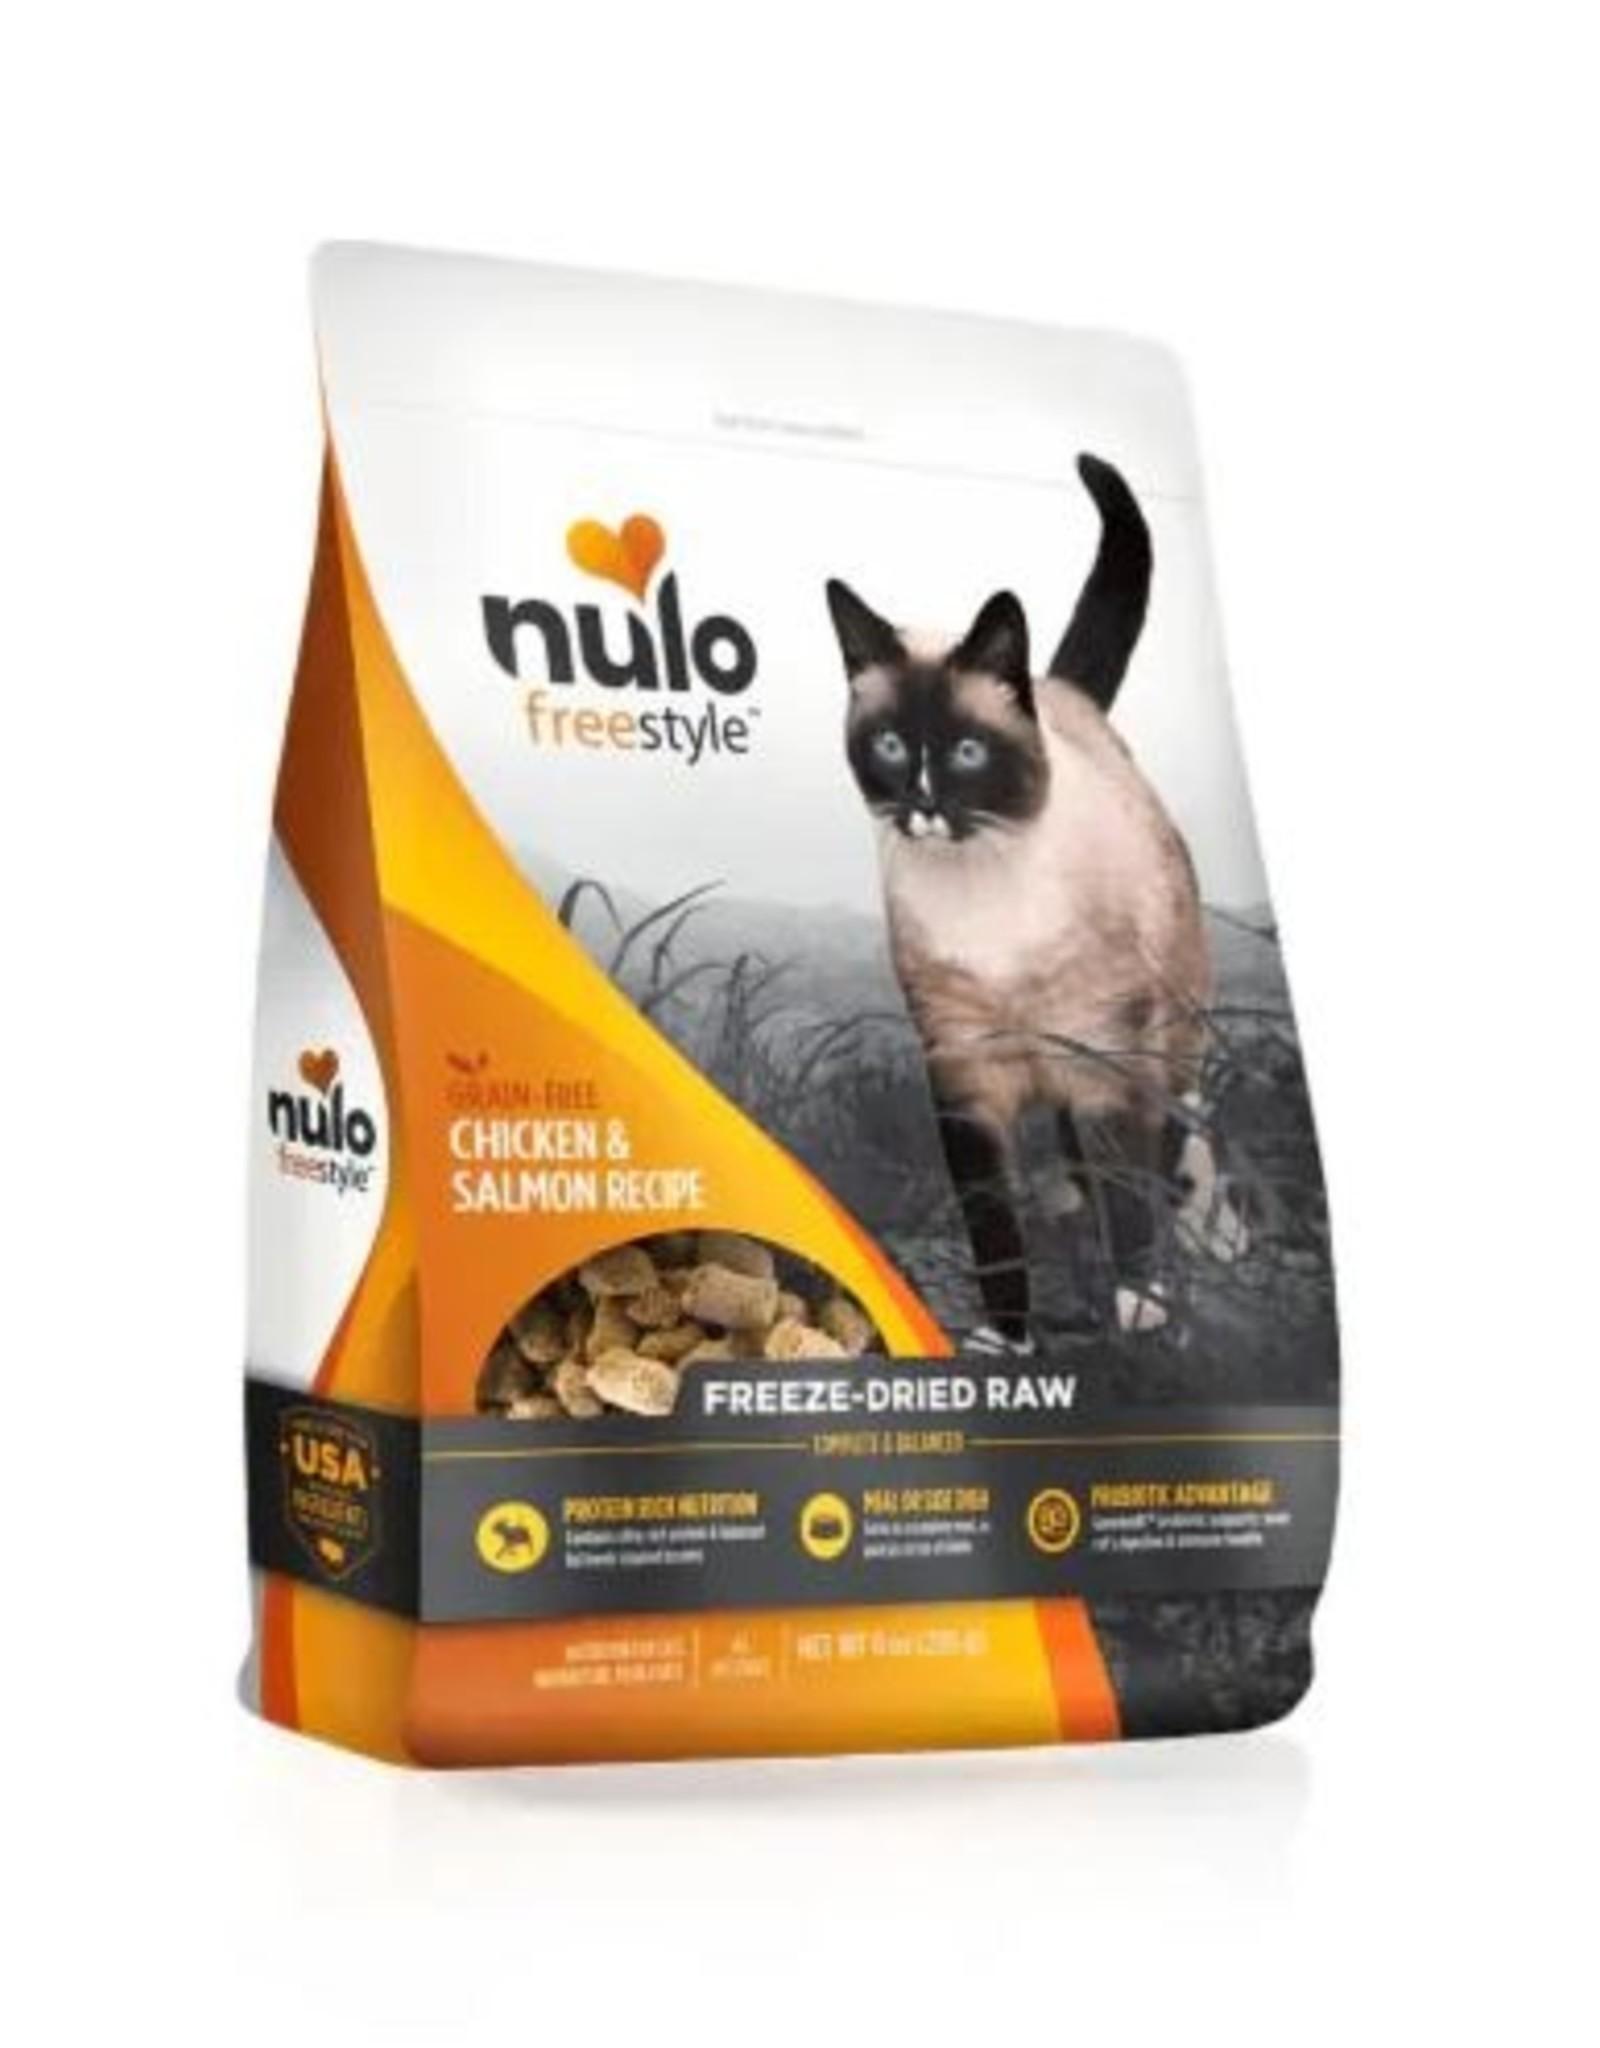 Nulo Freeze Dried Raw Grain Free Chicken & Salmon CAT Food 3.5 oz